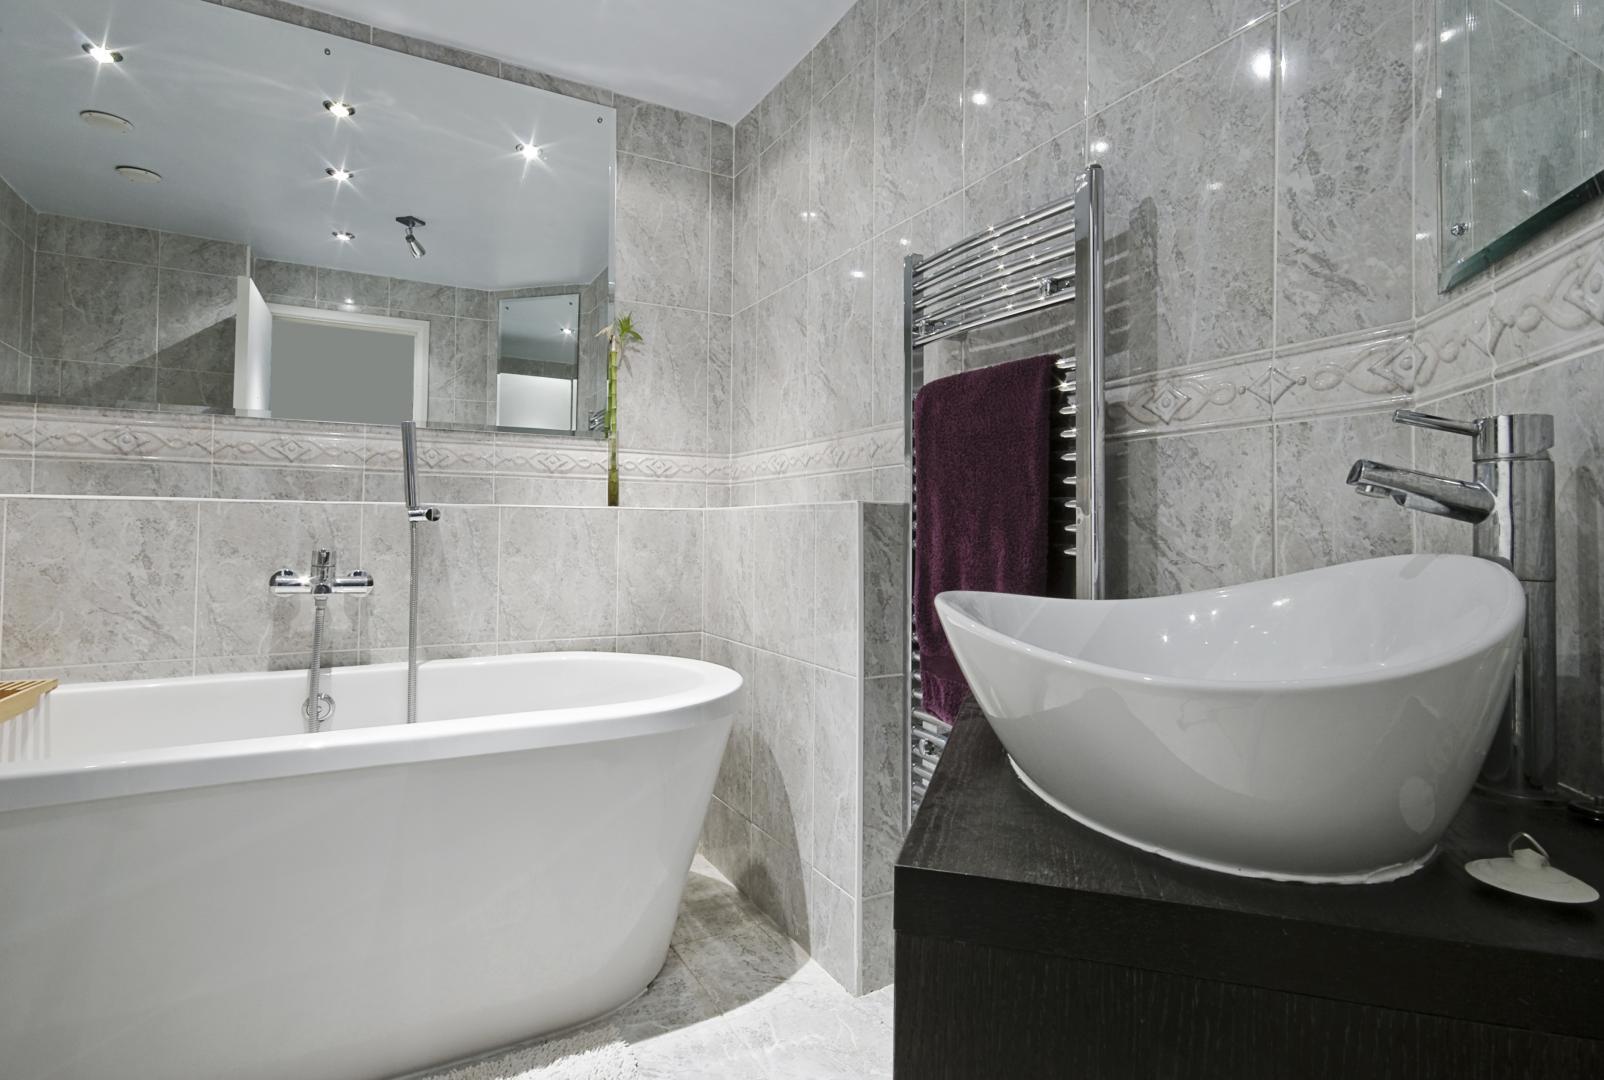 Salle De Bain Rambouillet ~ am nagement salle de bain neuilly sur marne paris versailles